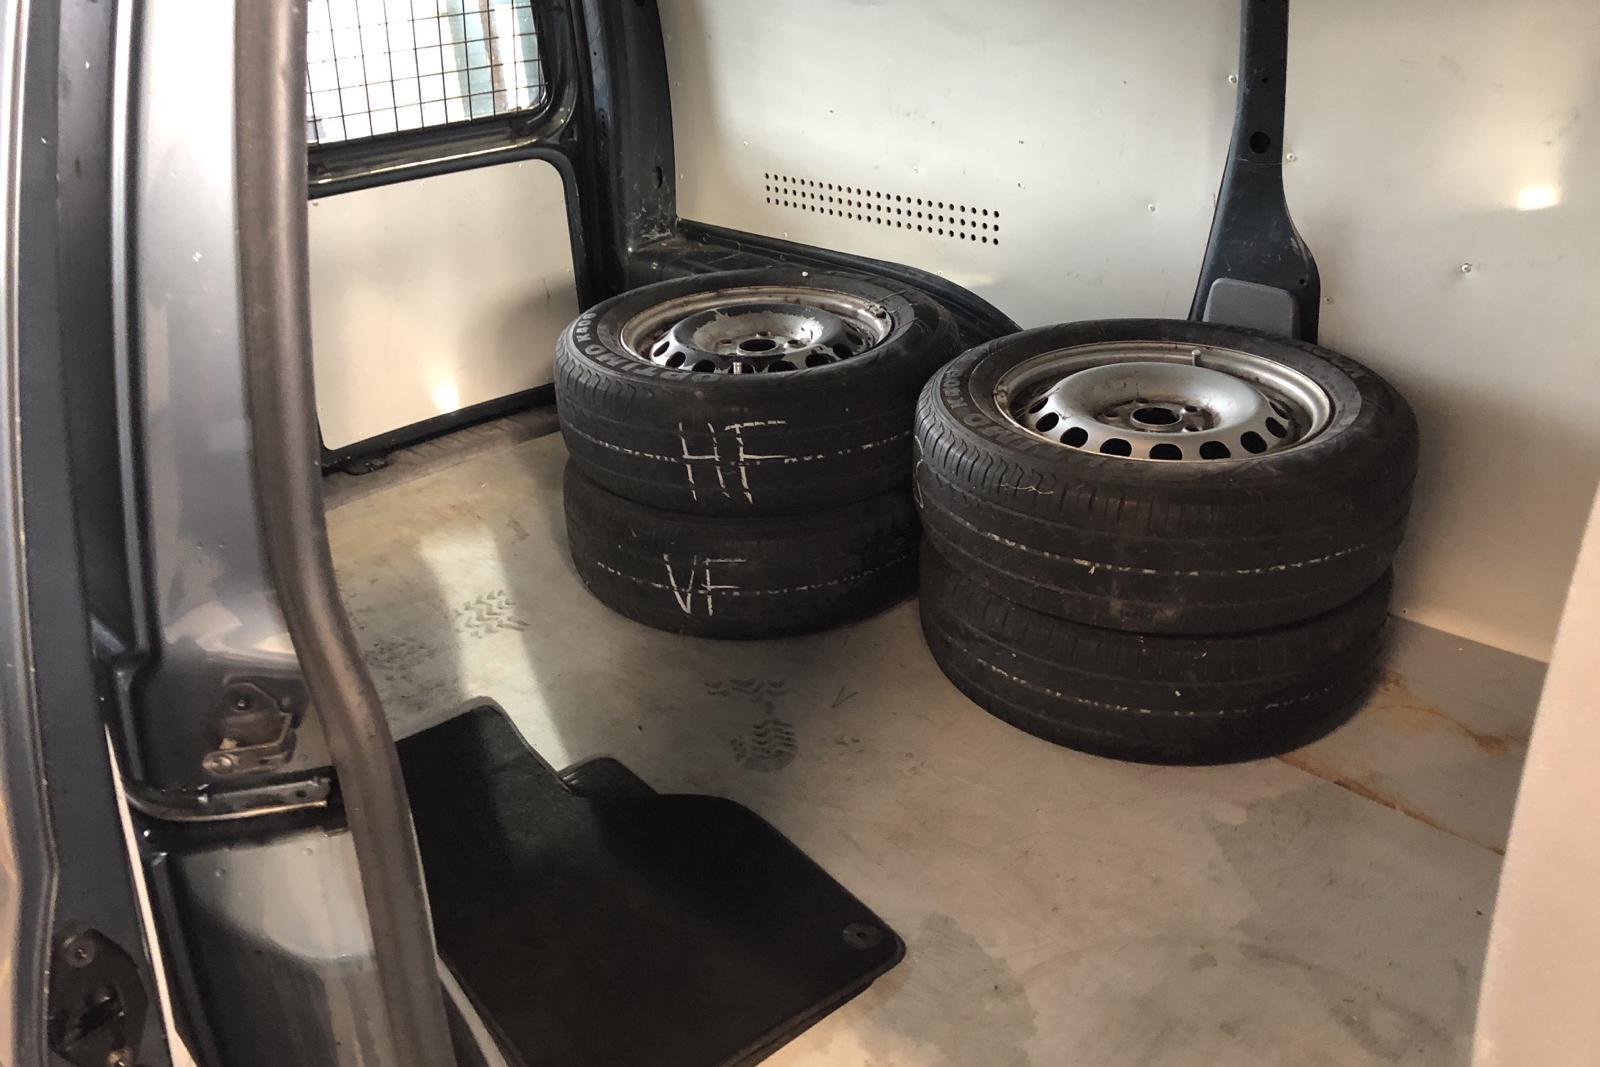 VW Caddy 1.9 TDI Maxi Skåp (105hk) - 17 843 mil - Manuell - Dark Grey - 2010